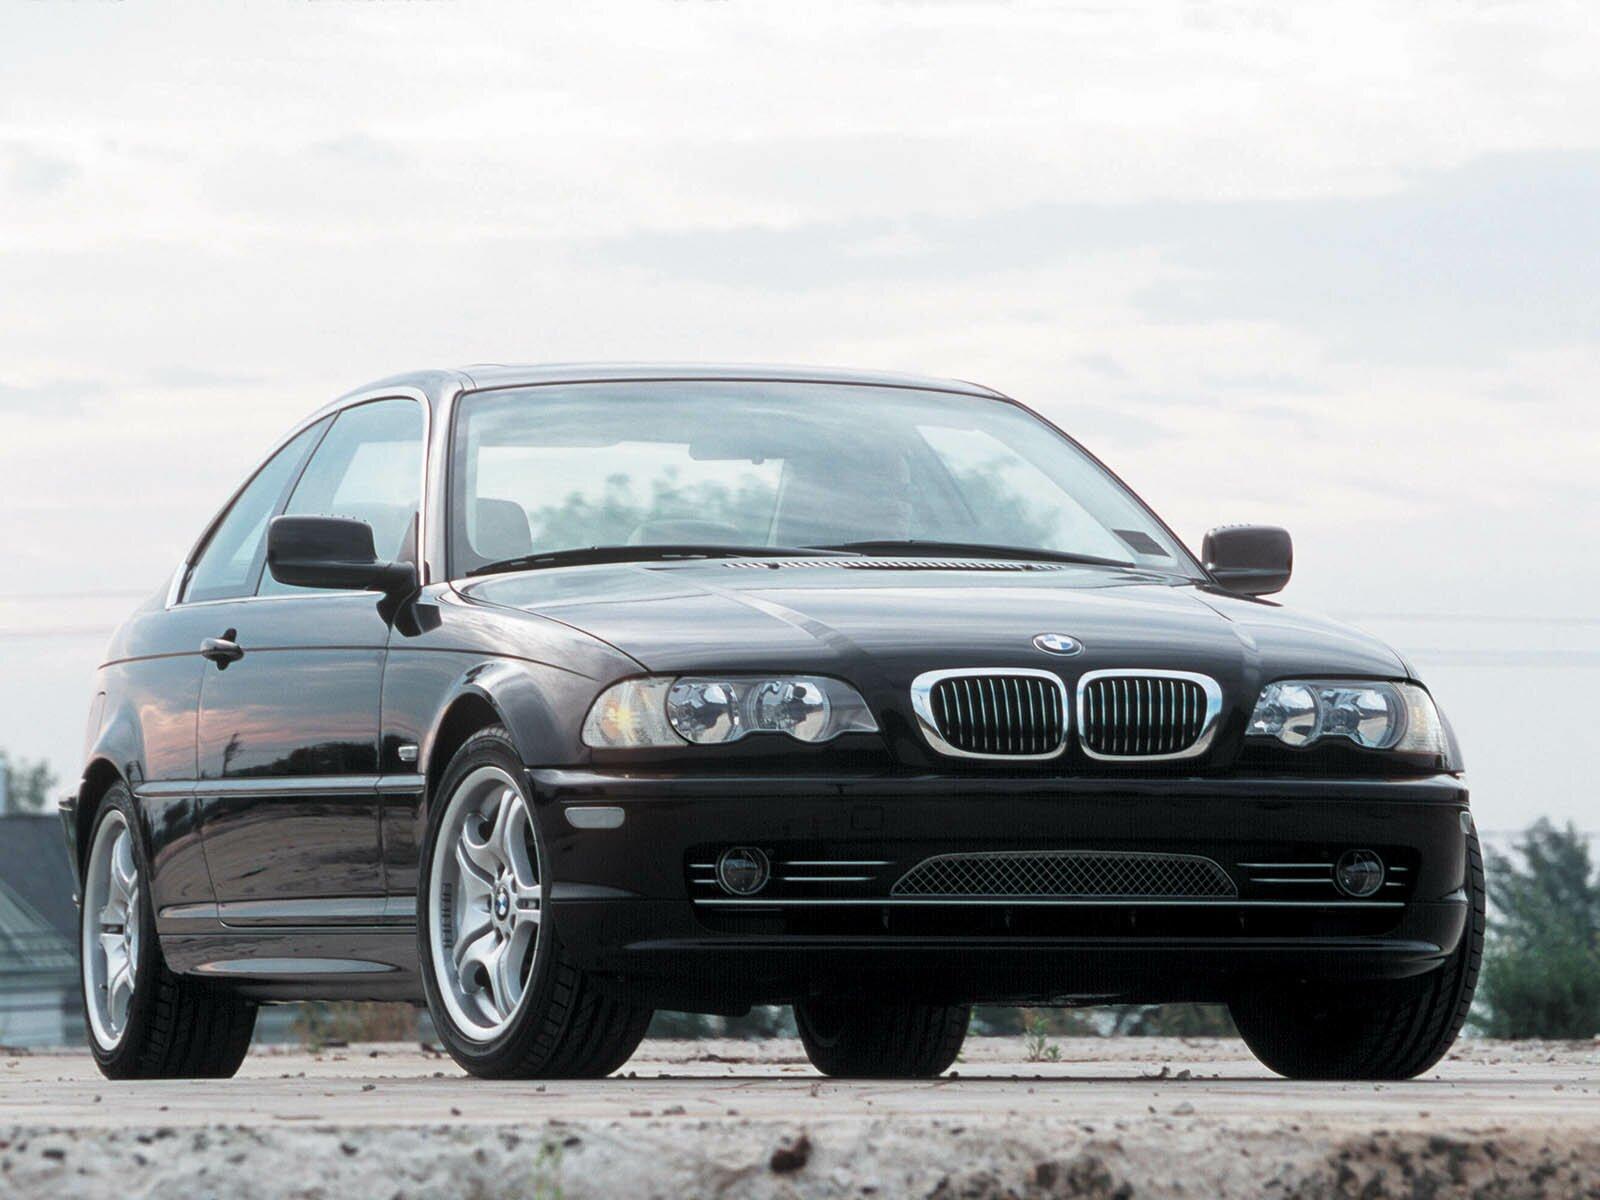 BMW 3 Series Coupe (E46) specs & photos - 1999, 2000, 2001, 2002, 2003 - autoevolution